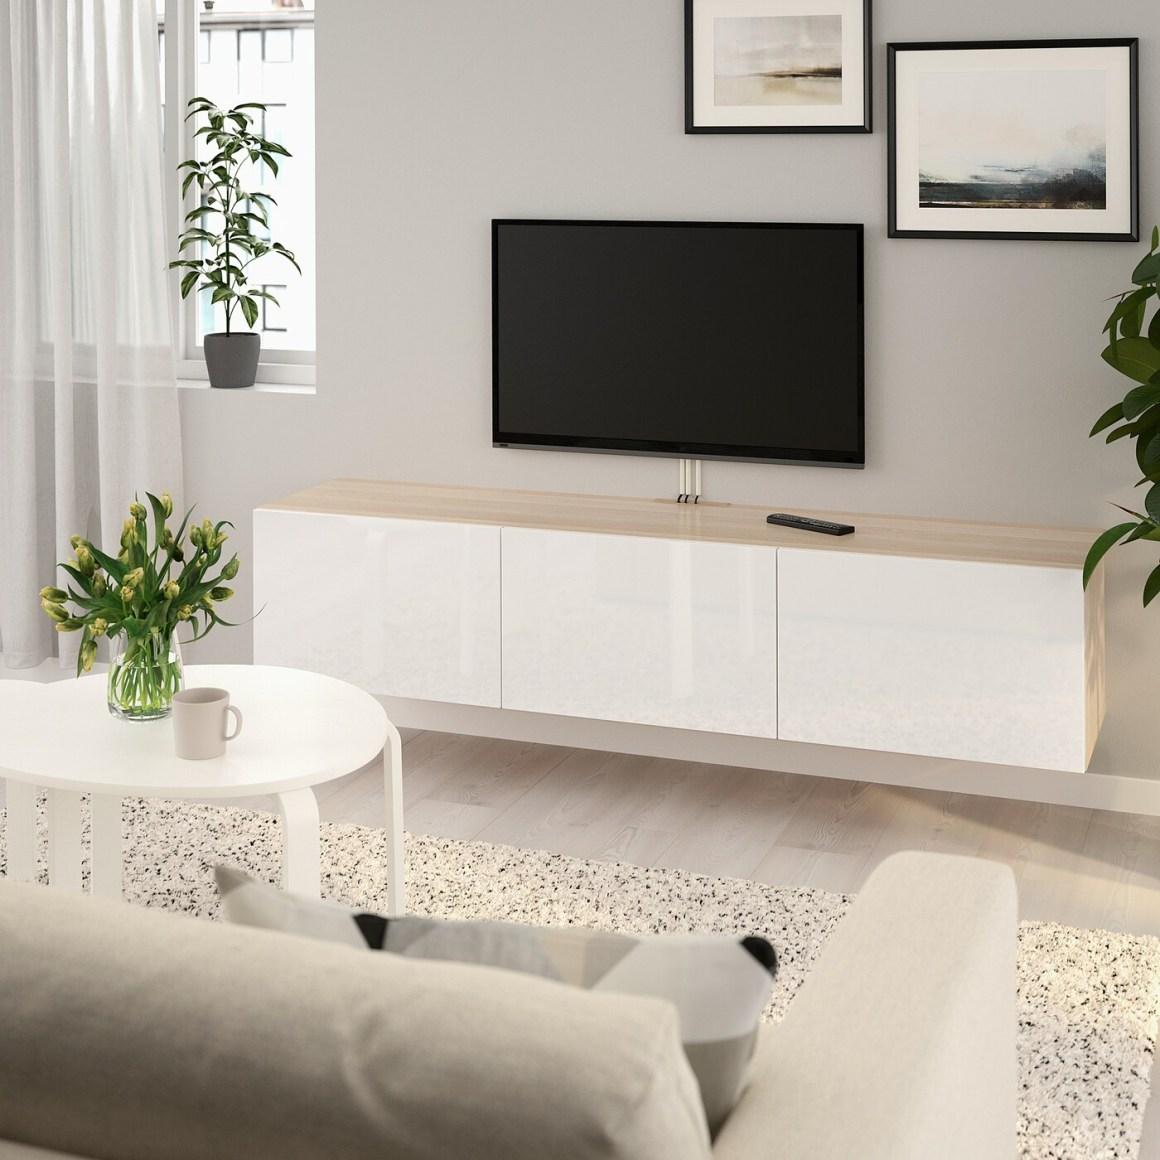 Mueble de salón de IKEA